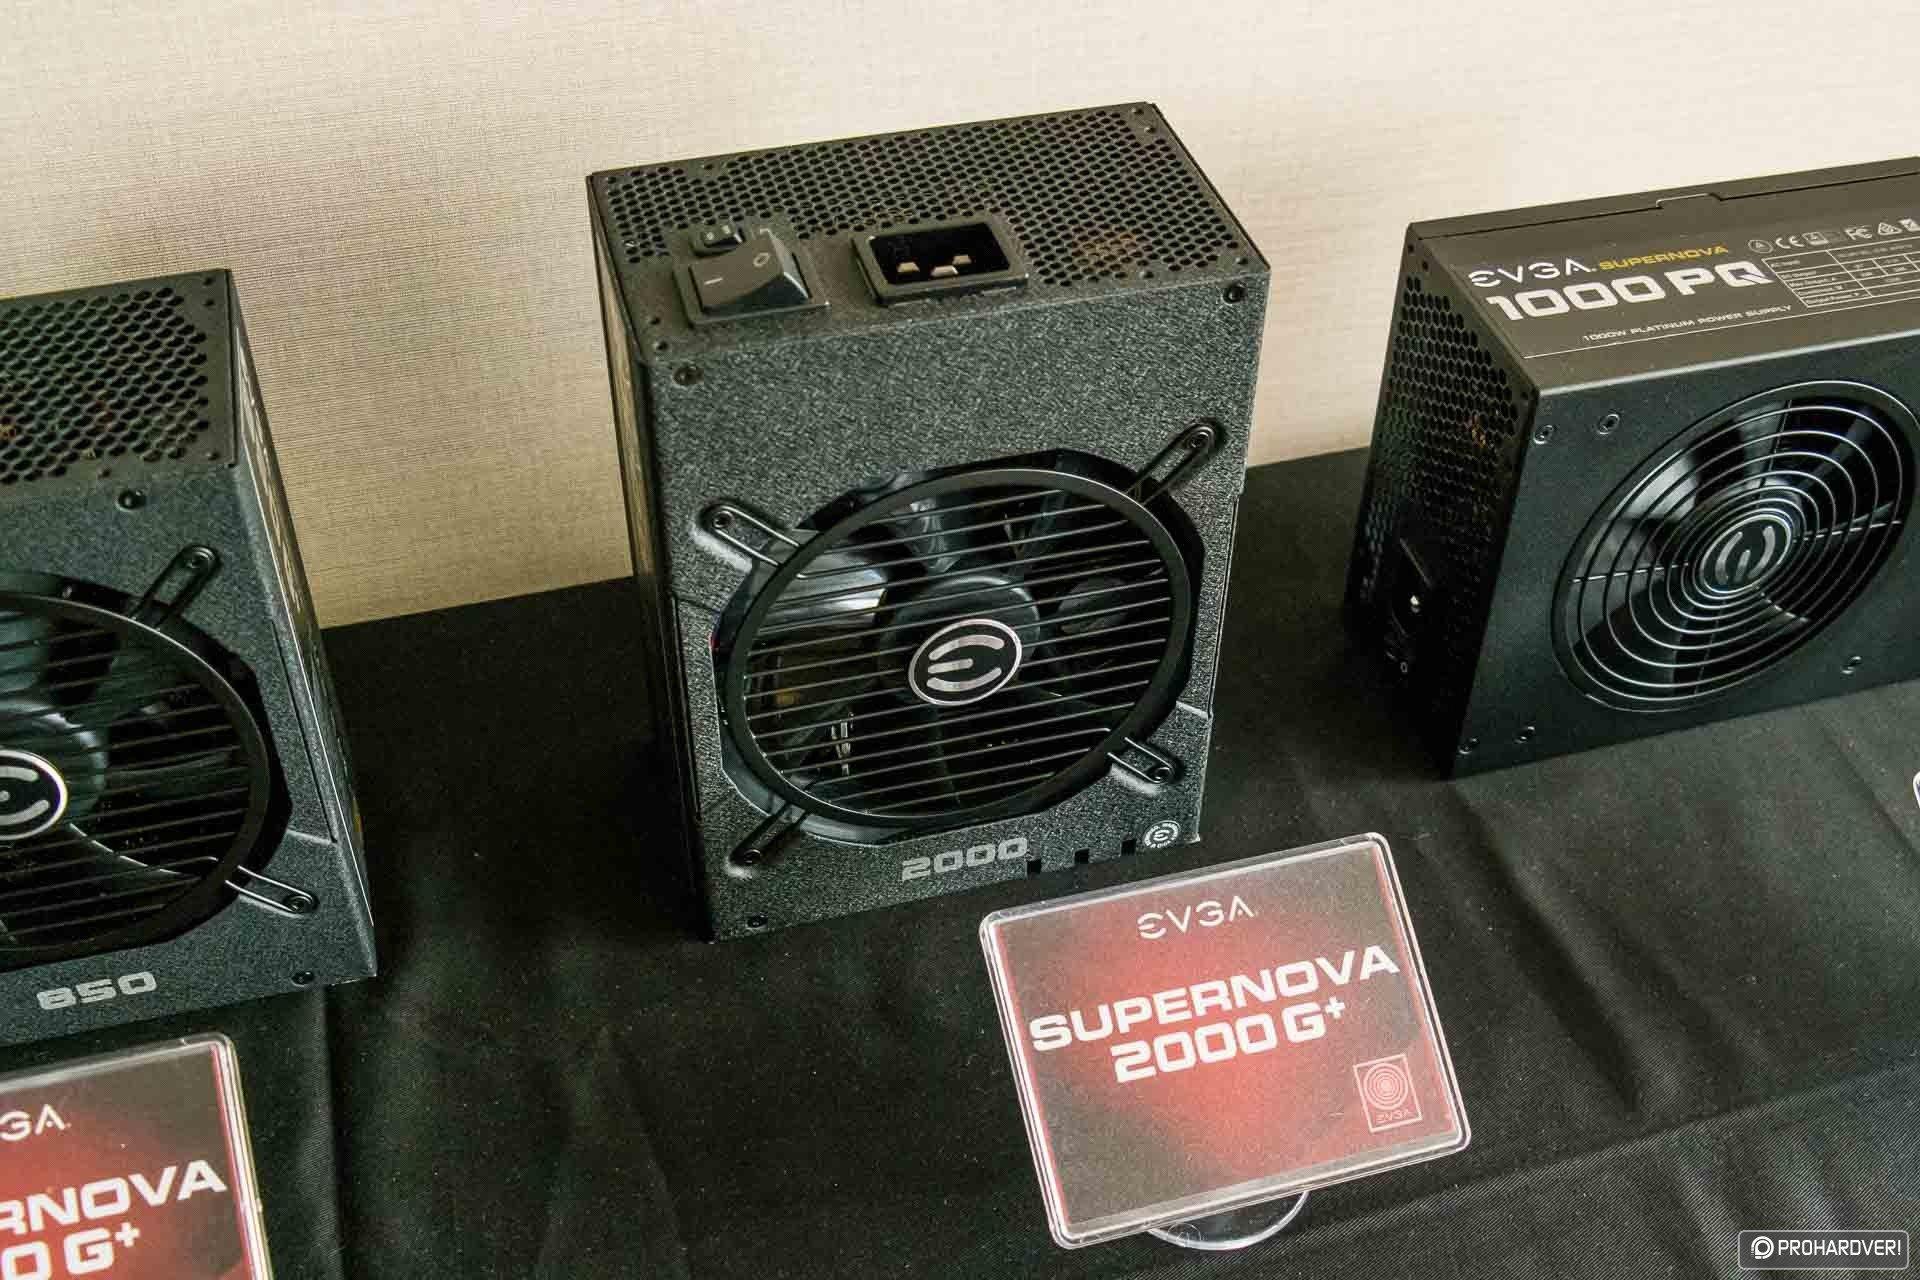 Super-Nova-2000G+